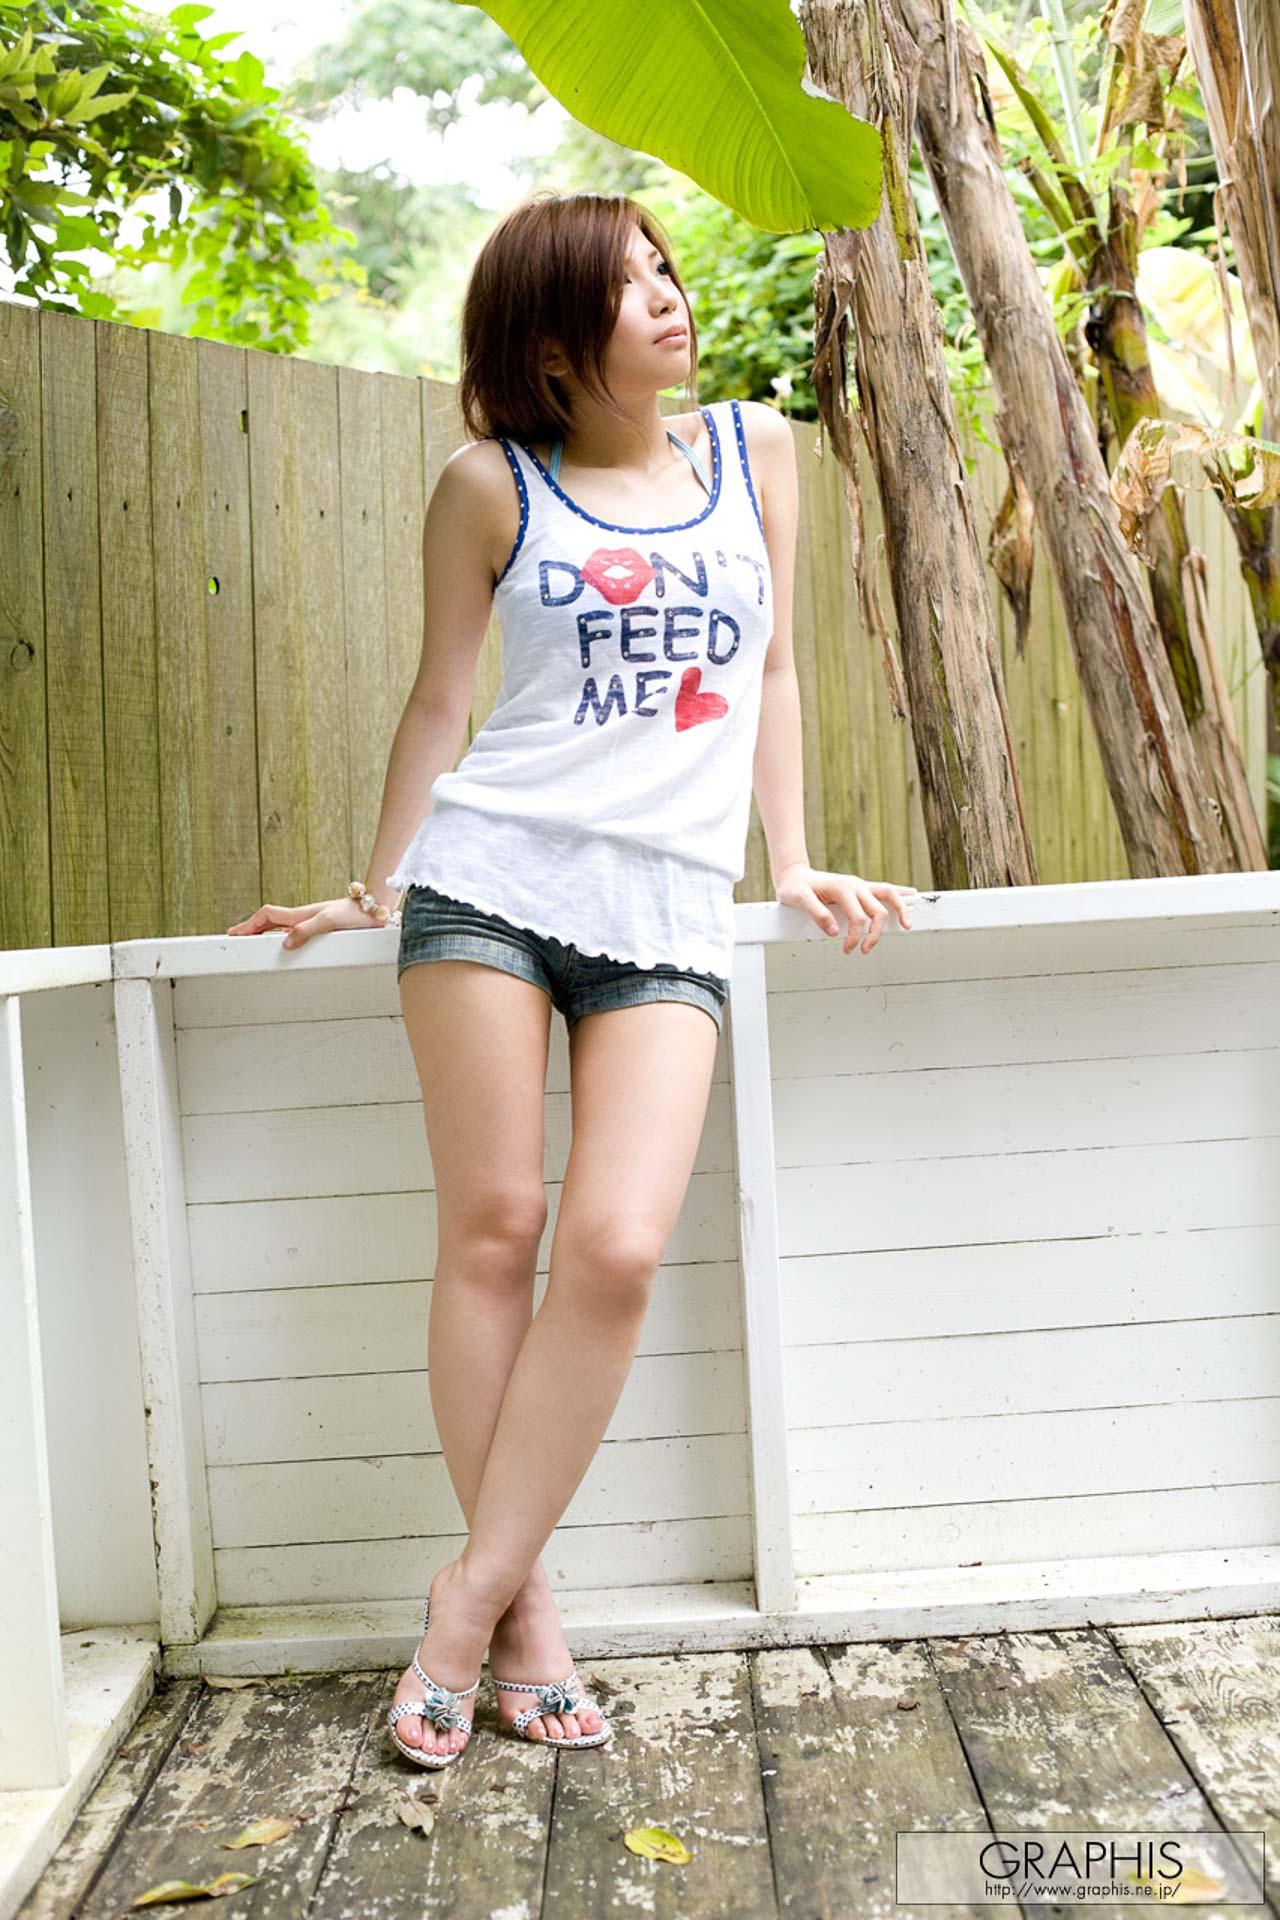 白嫩水滴美乳清晰笑容根本完美 愛原つばさ - 亞洲美女 -